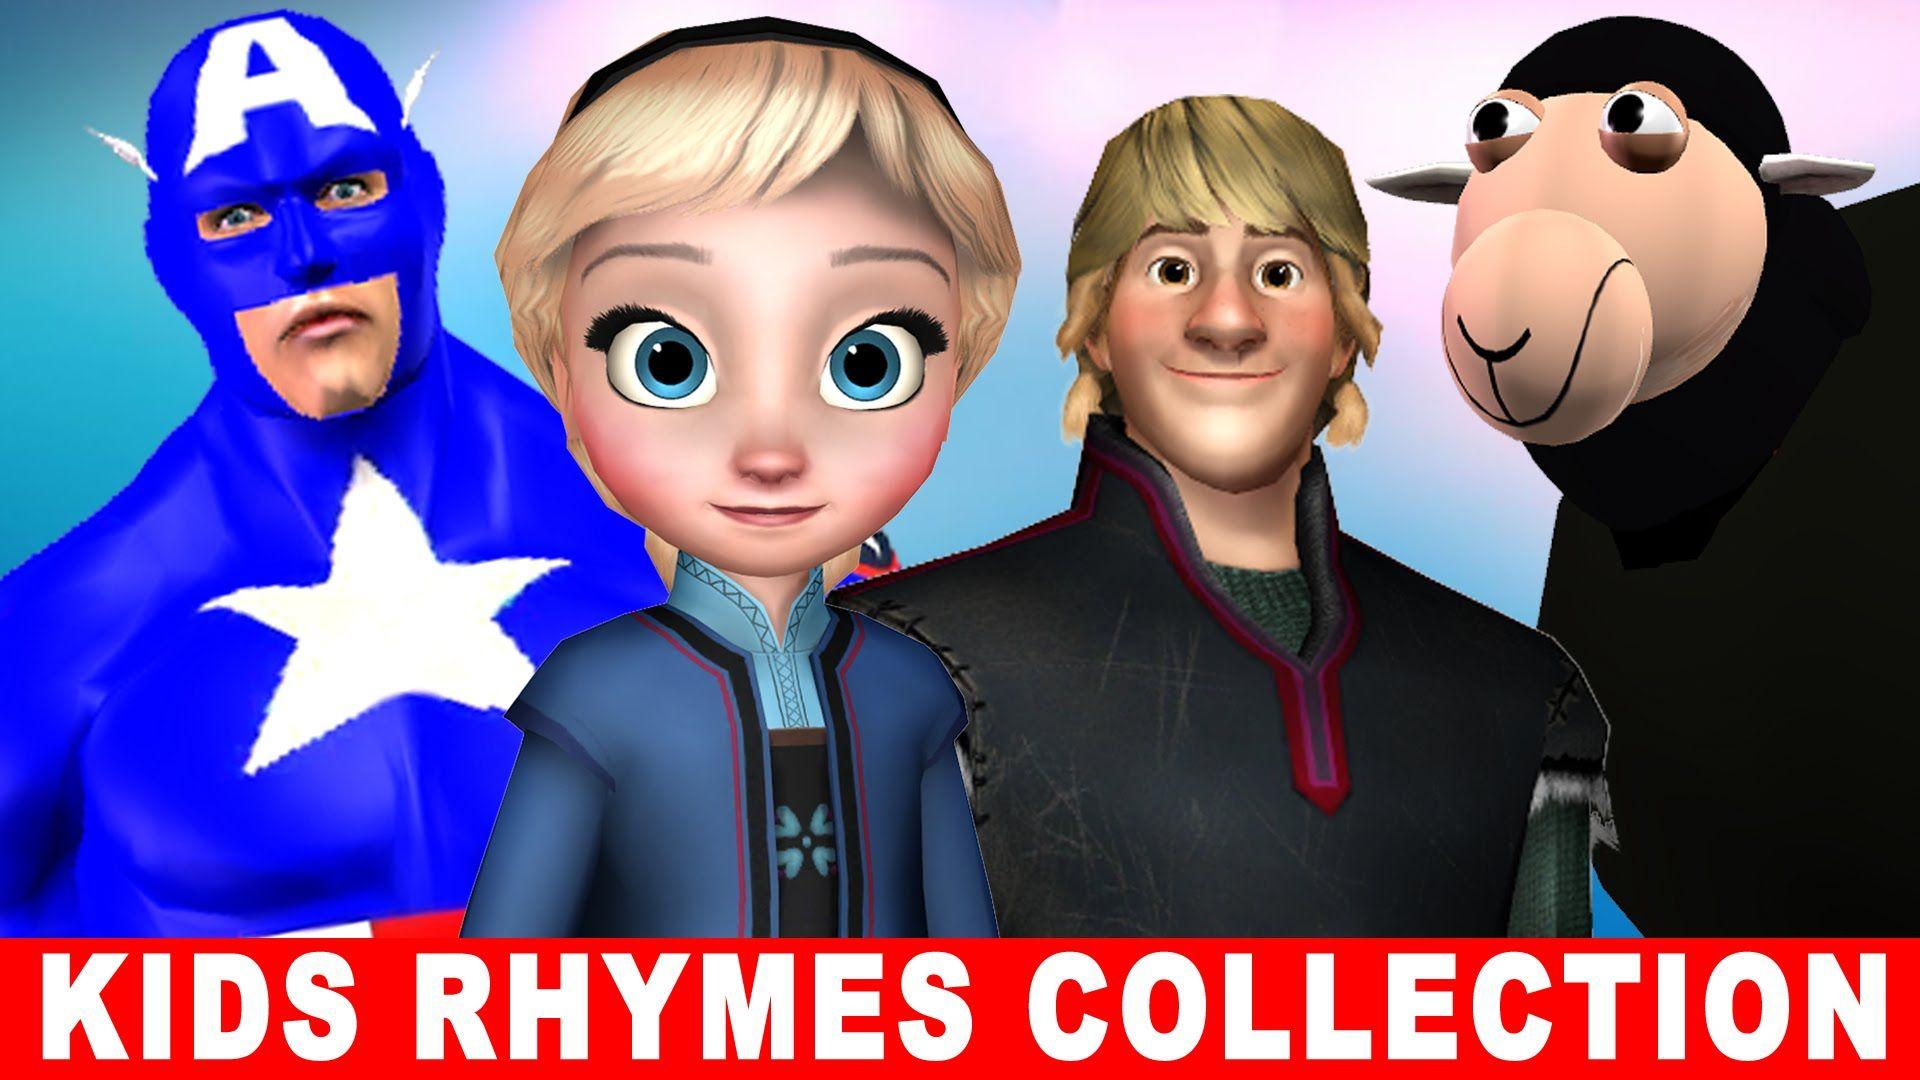 Captain America,Batman,Ironman,Frozen Elsa - Cartoon Nursery Rhymes Coll...